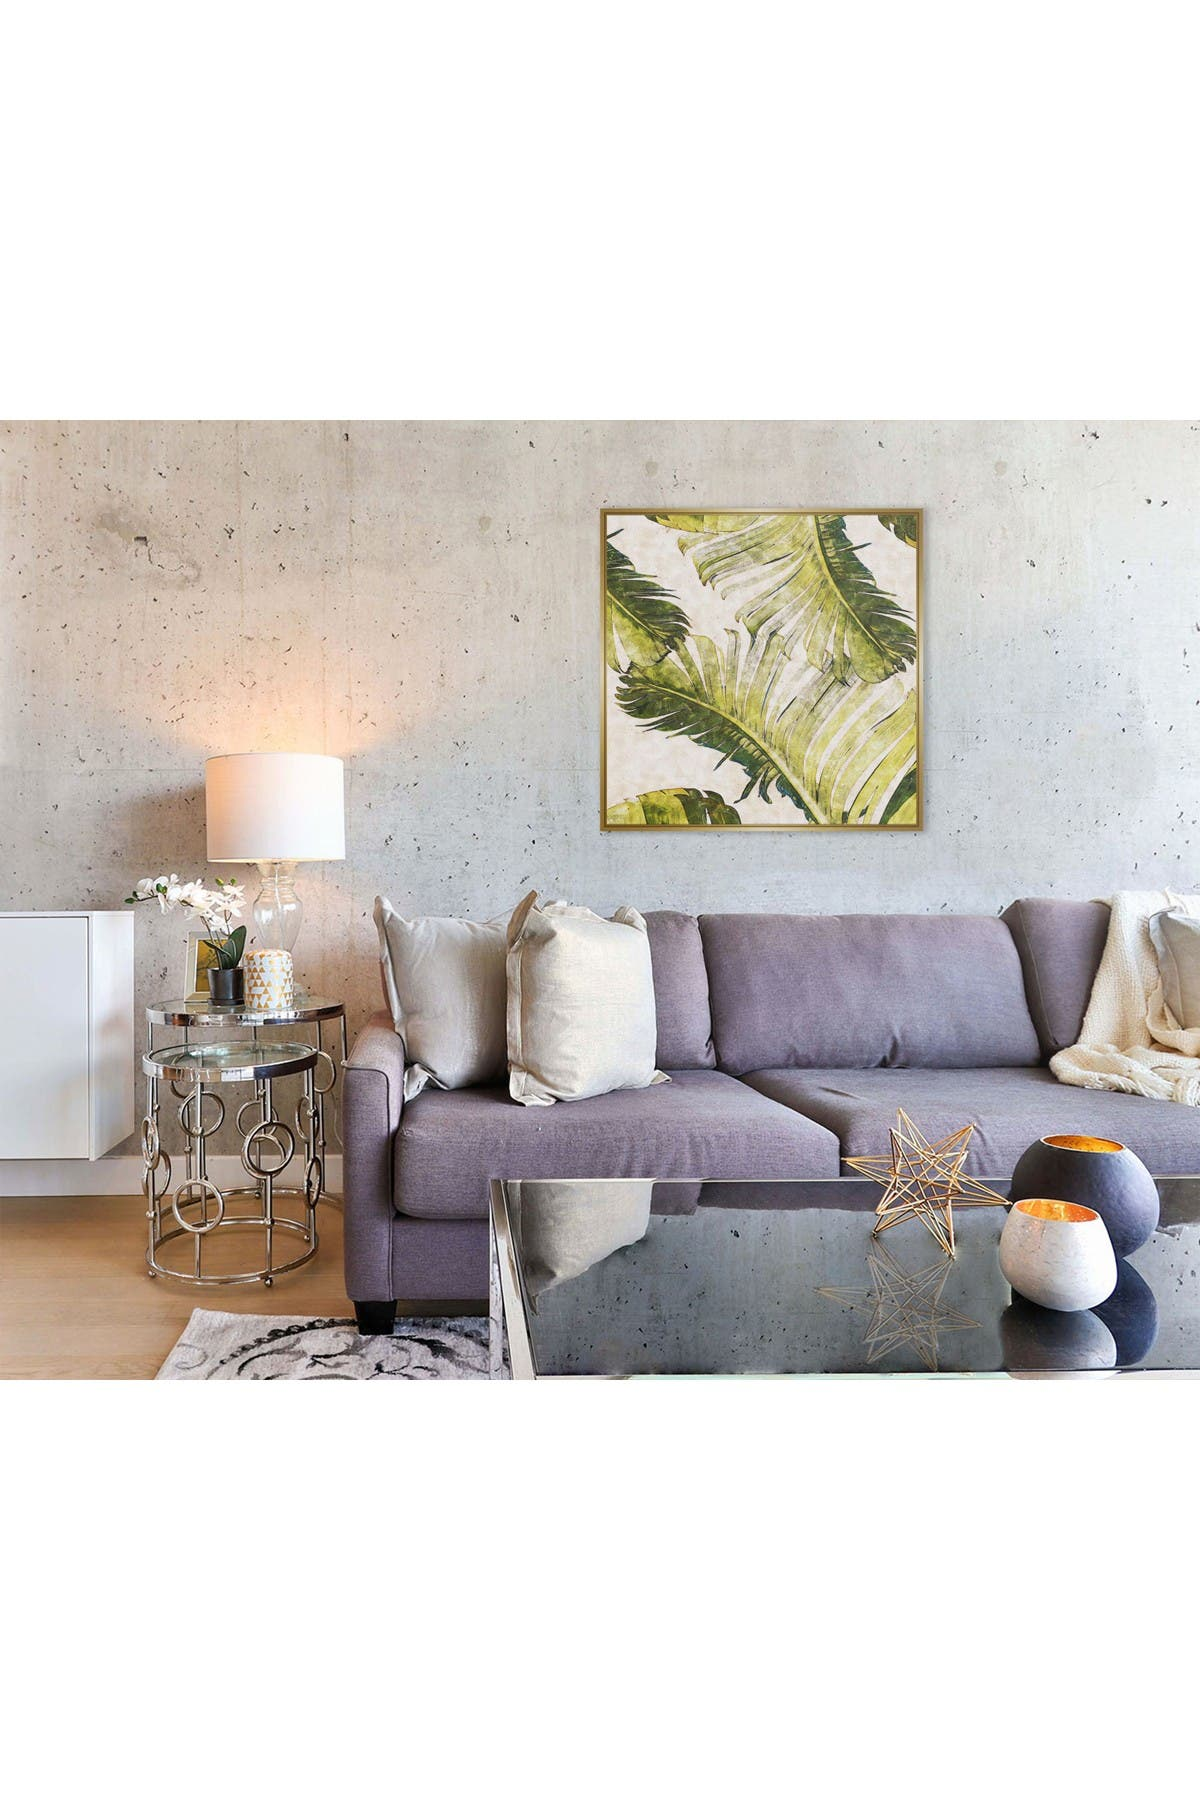 Image of PTM Images Large Botanical #58 Square Canvas